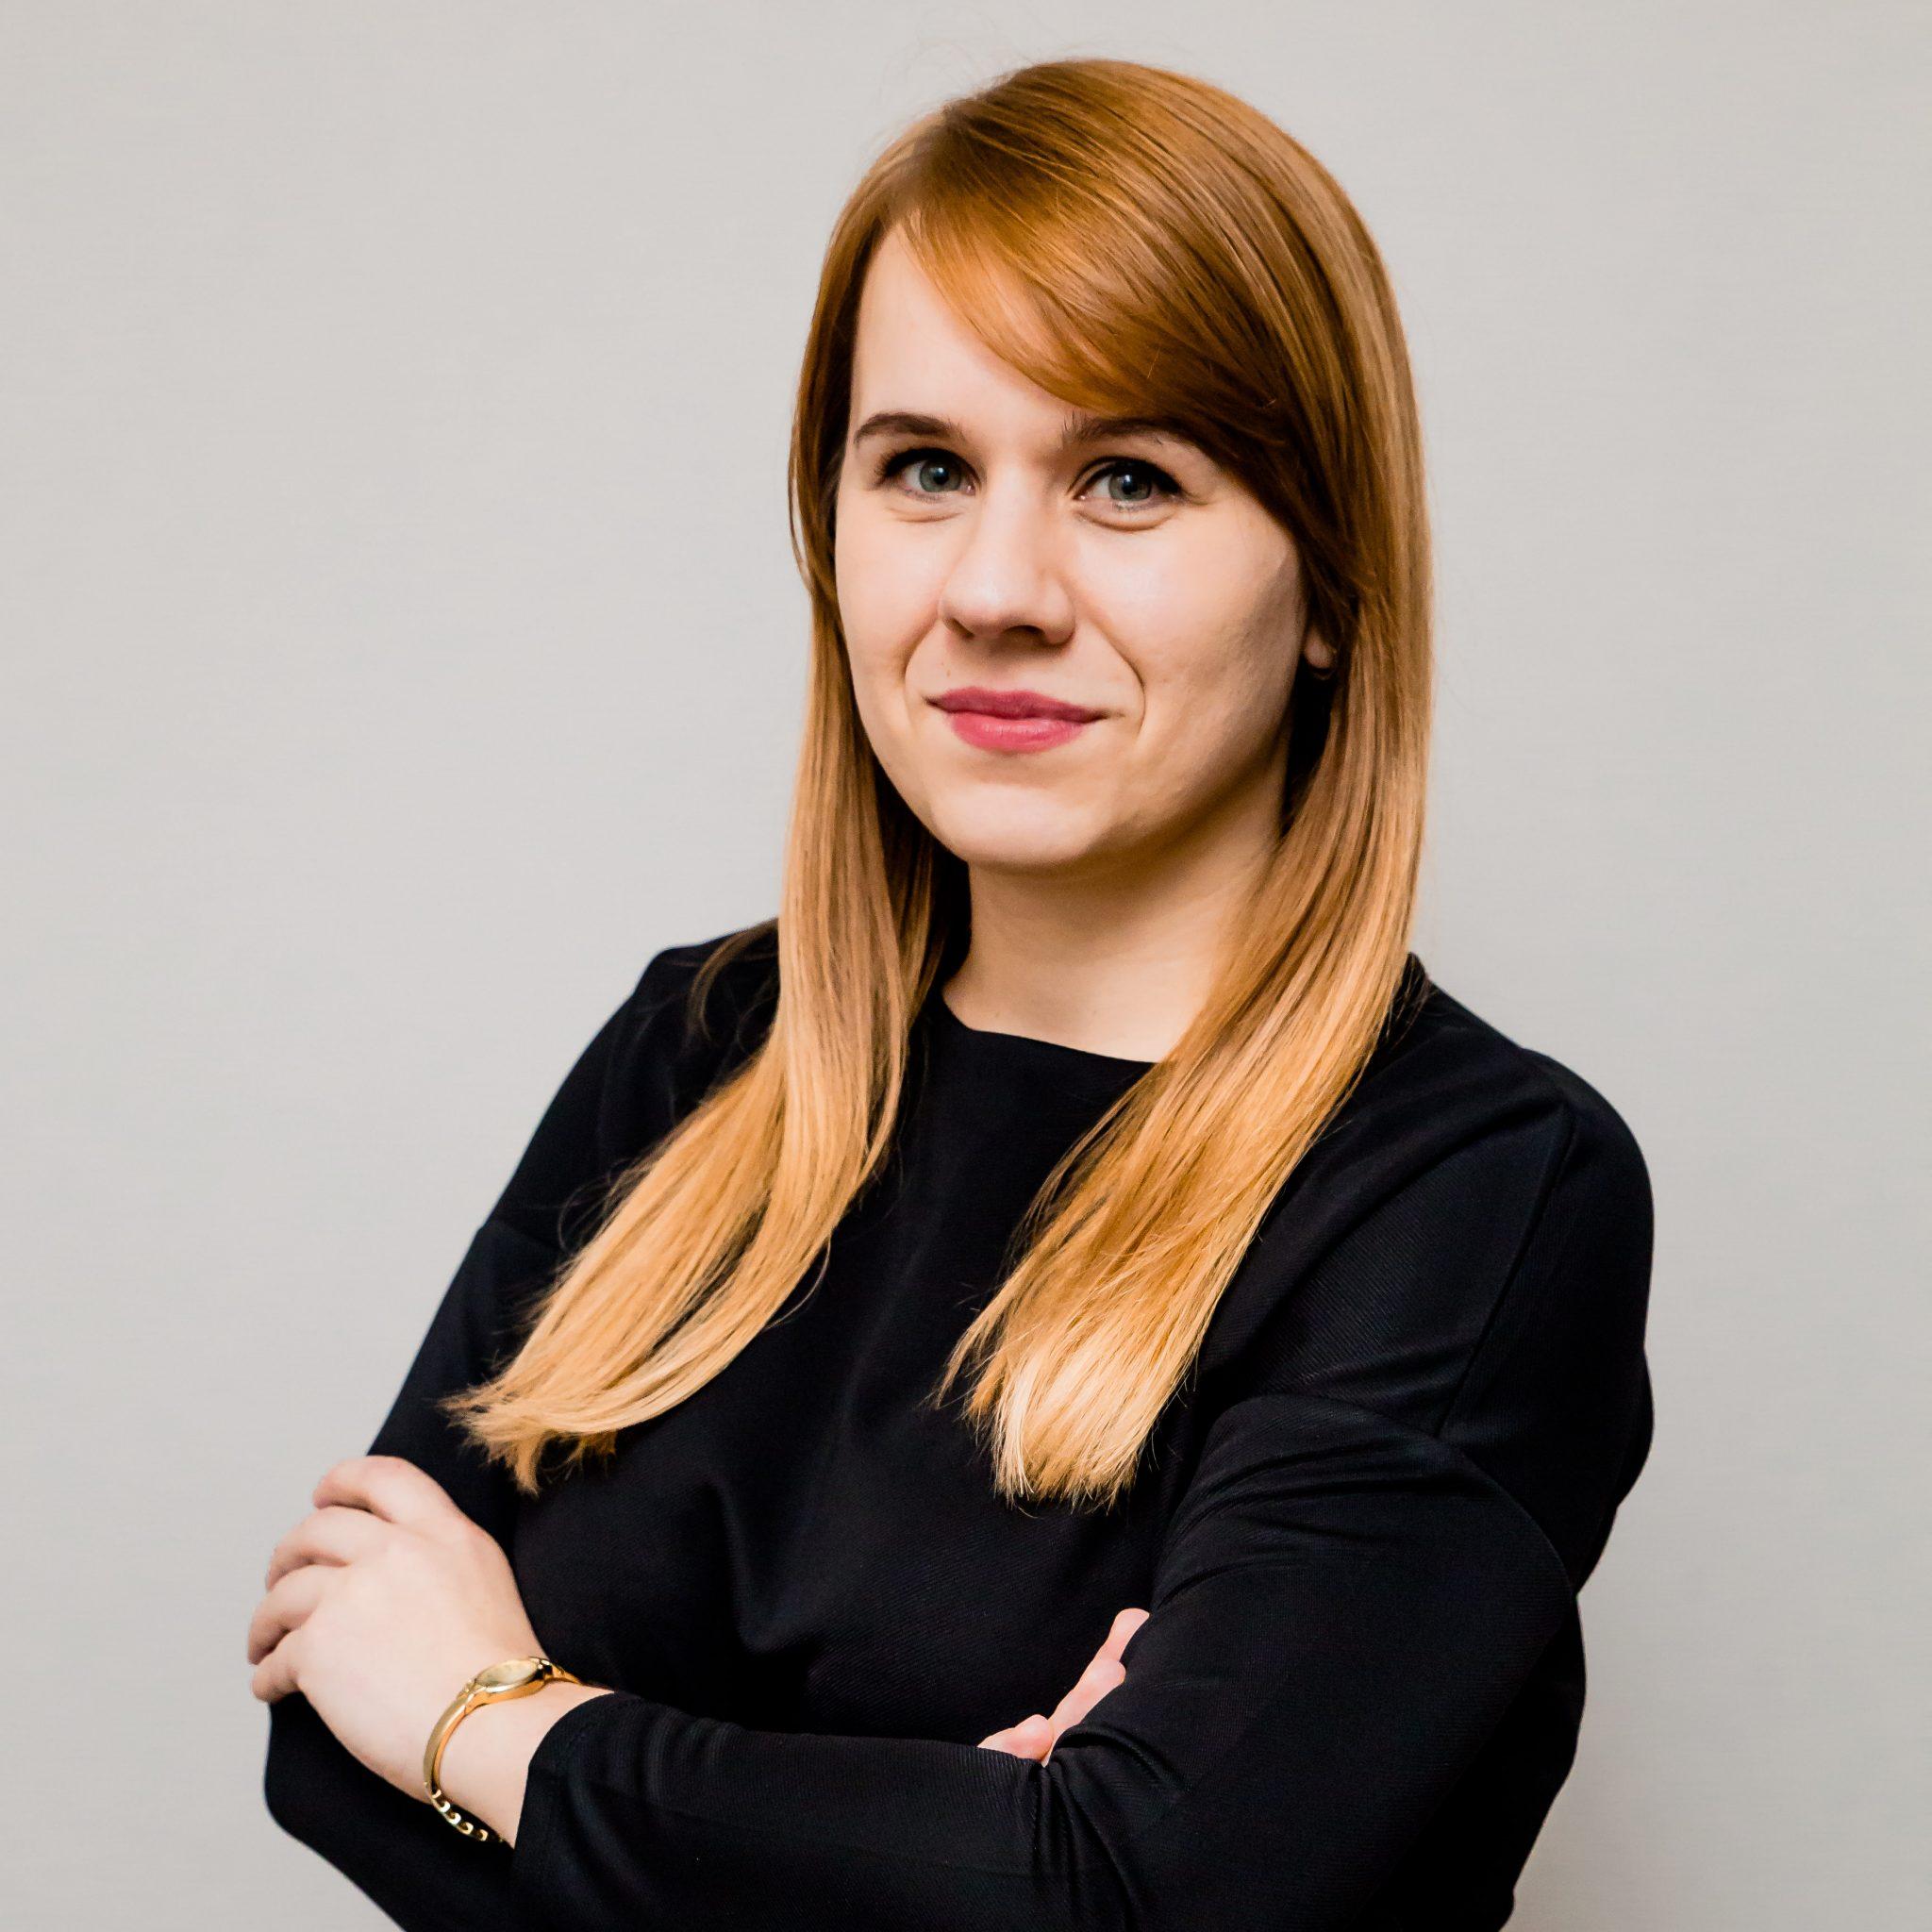 Diana Biel